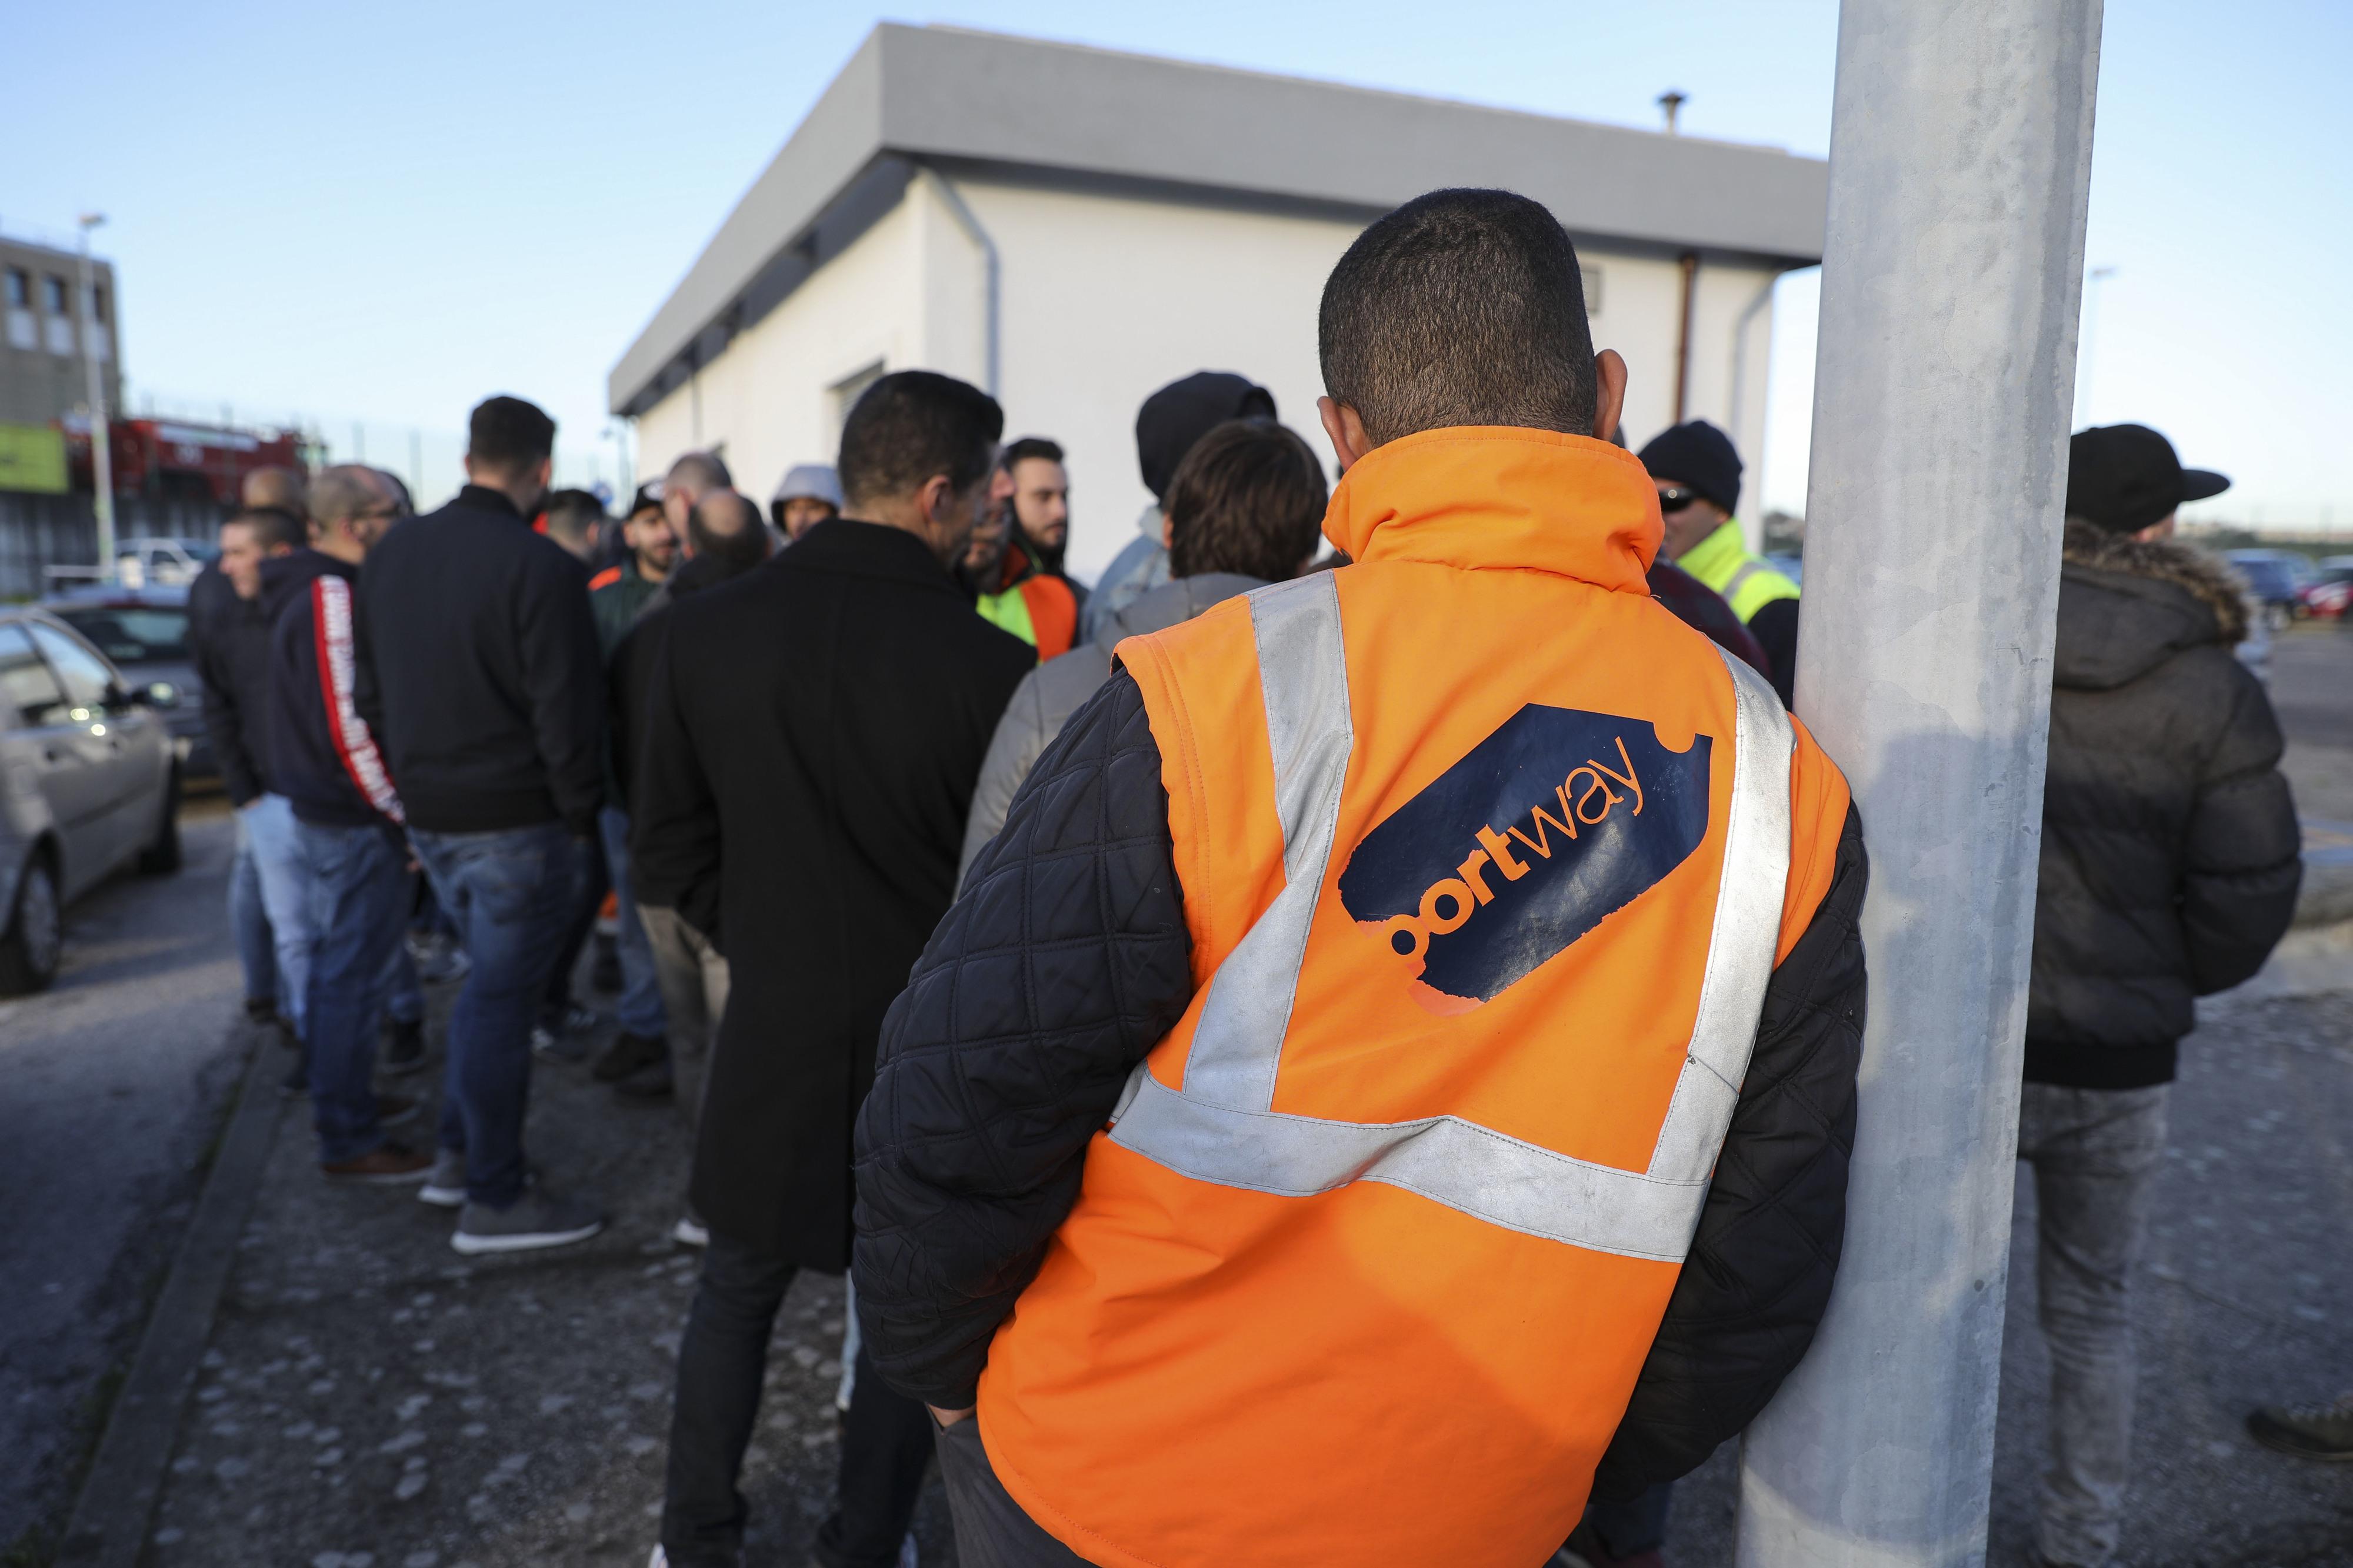 Empresa de assistência nos aeroportos Portway avança para 'lay-off'